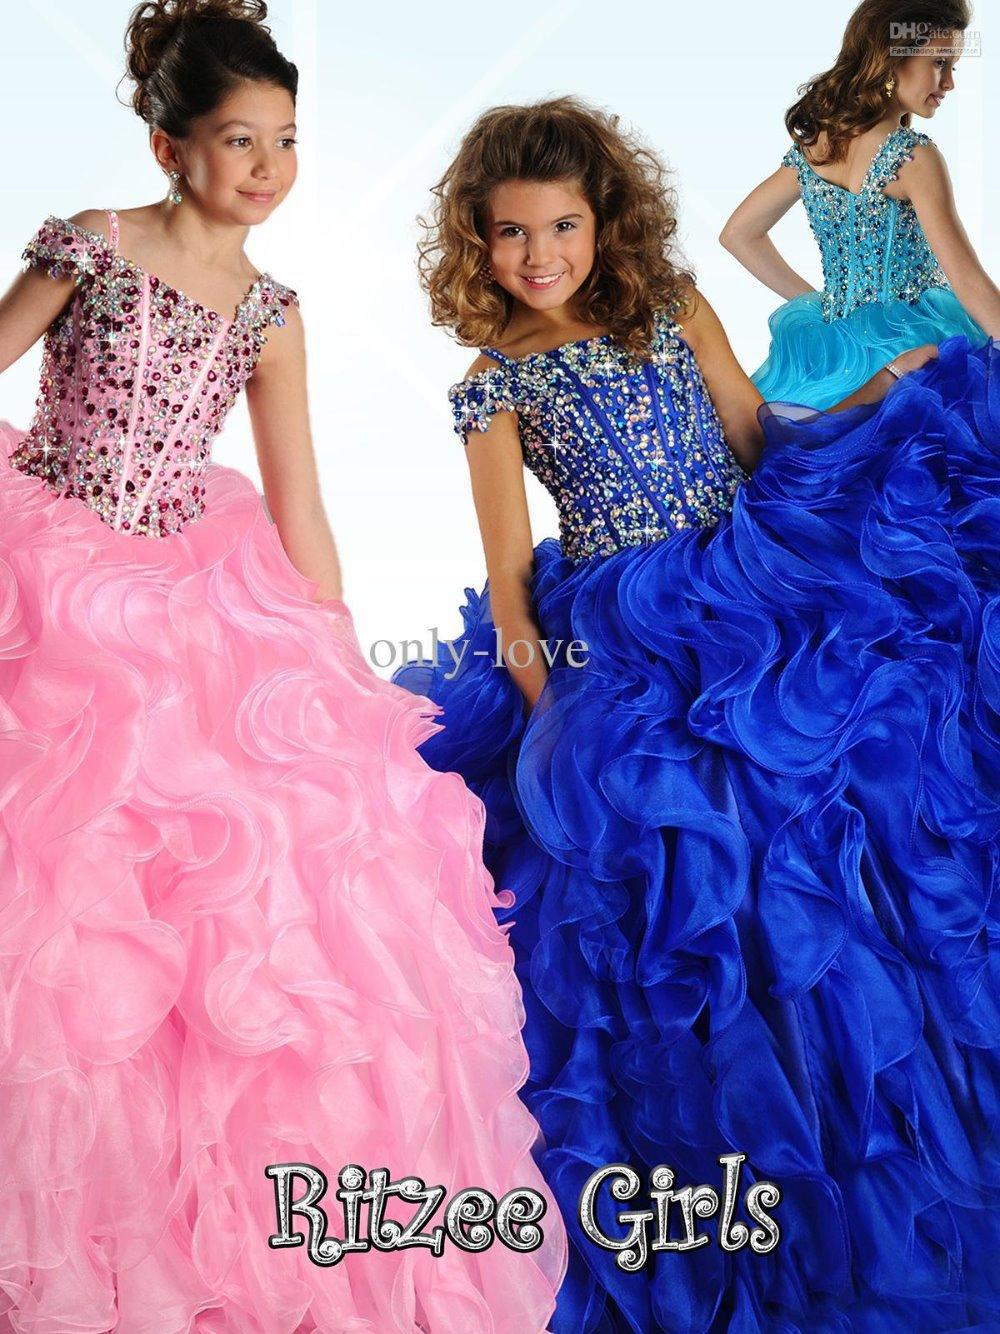 फूल लड़की ड्रेस 2015 नई एक - वेडिंग पार्टी कपड़े